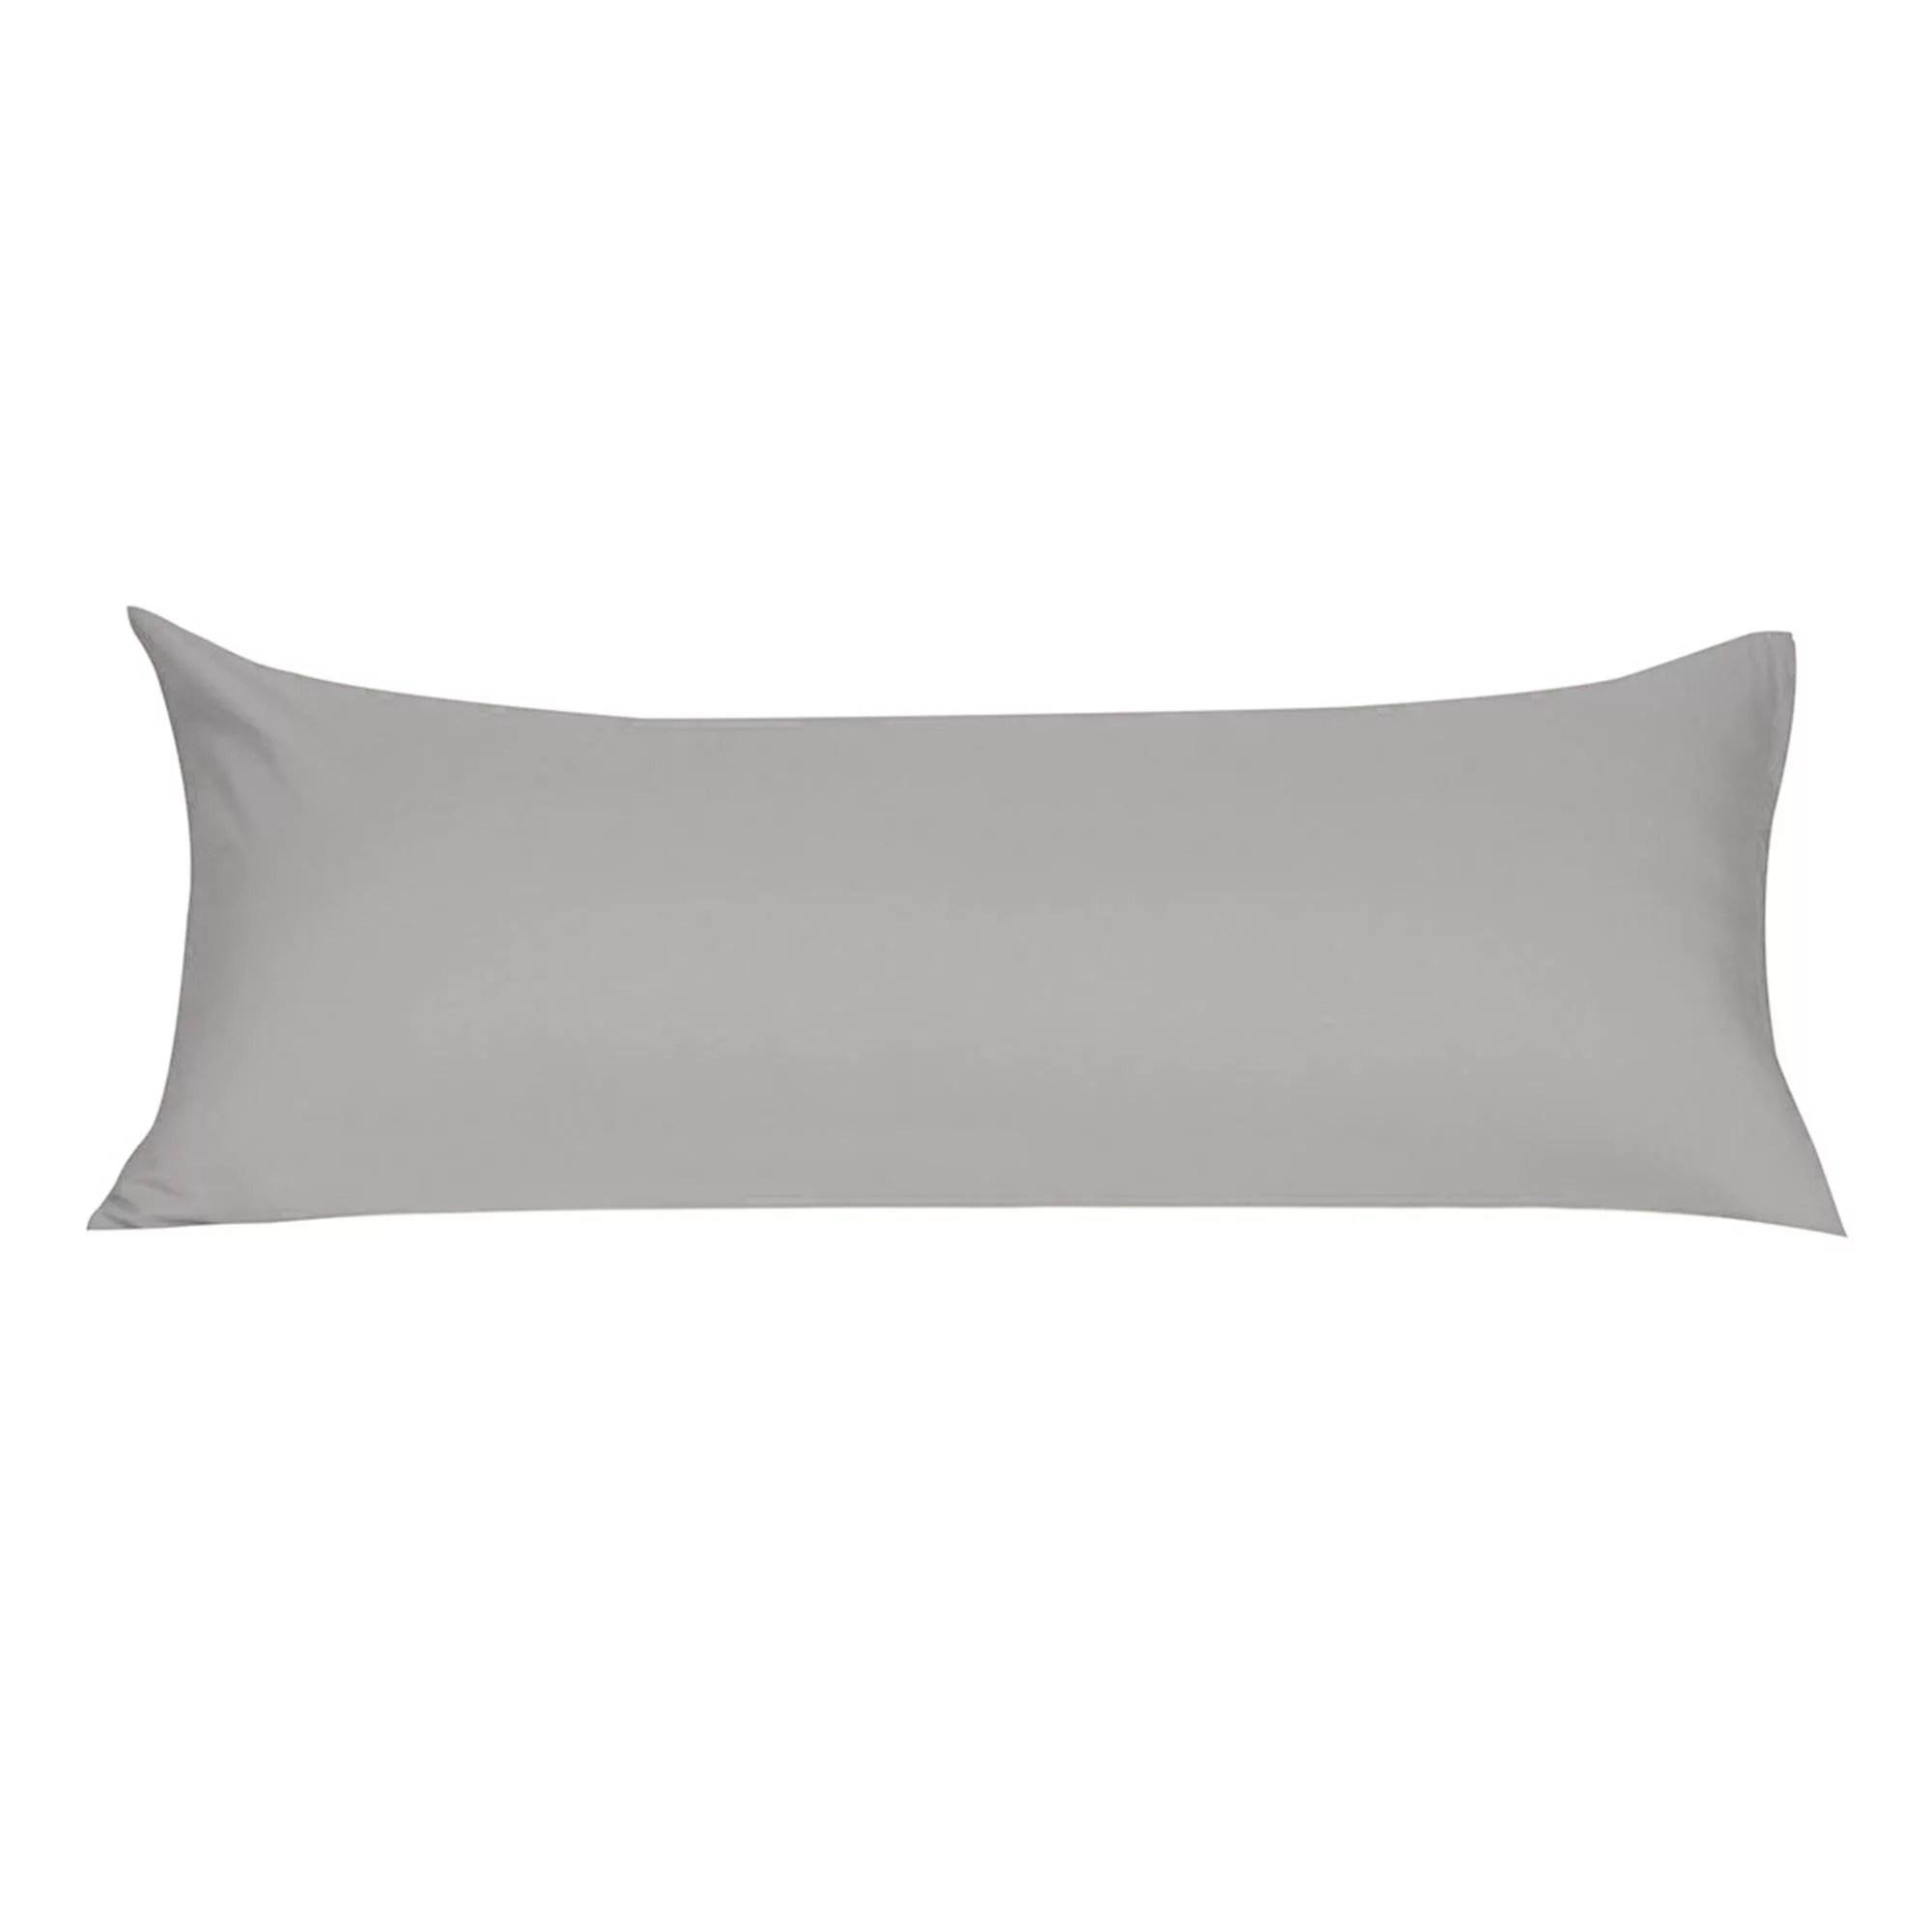 body pillow covers walmart com